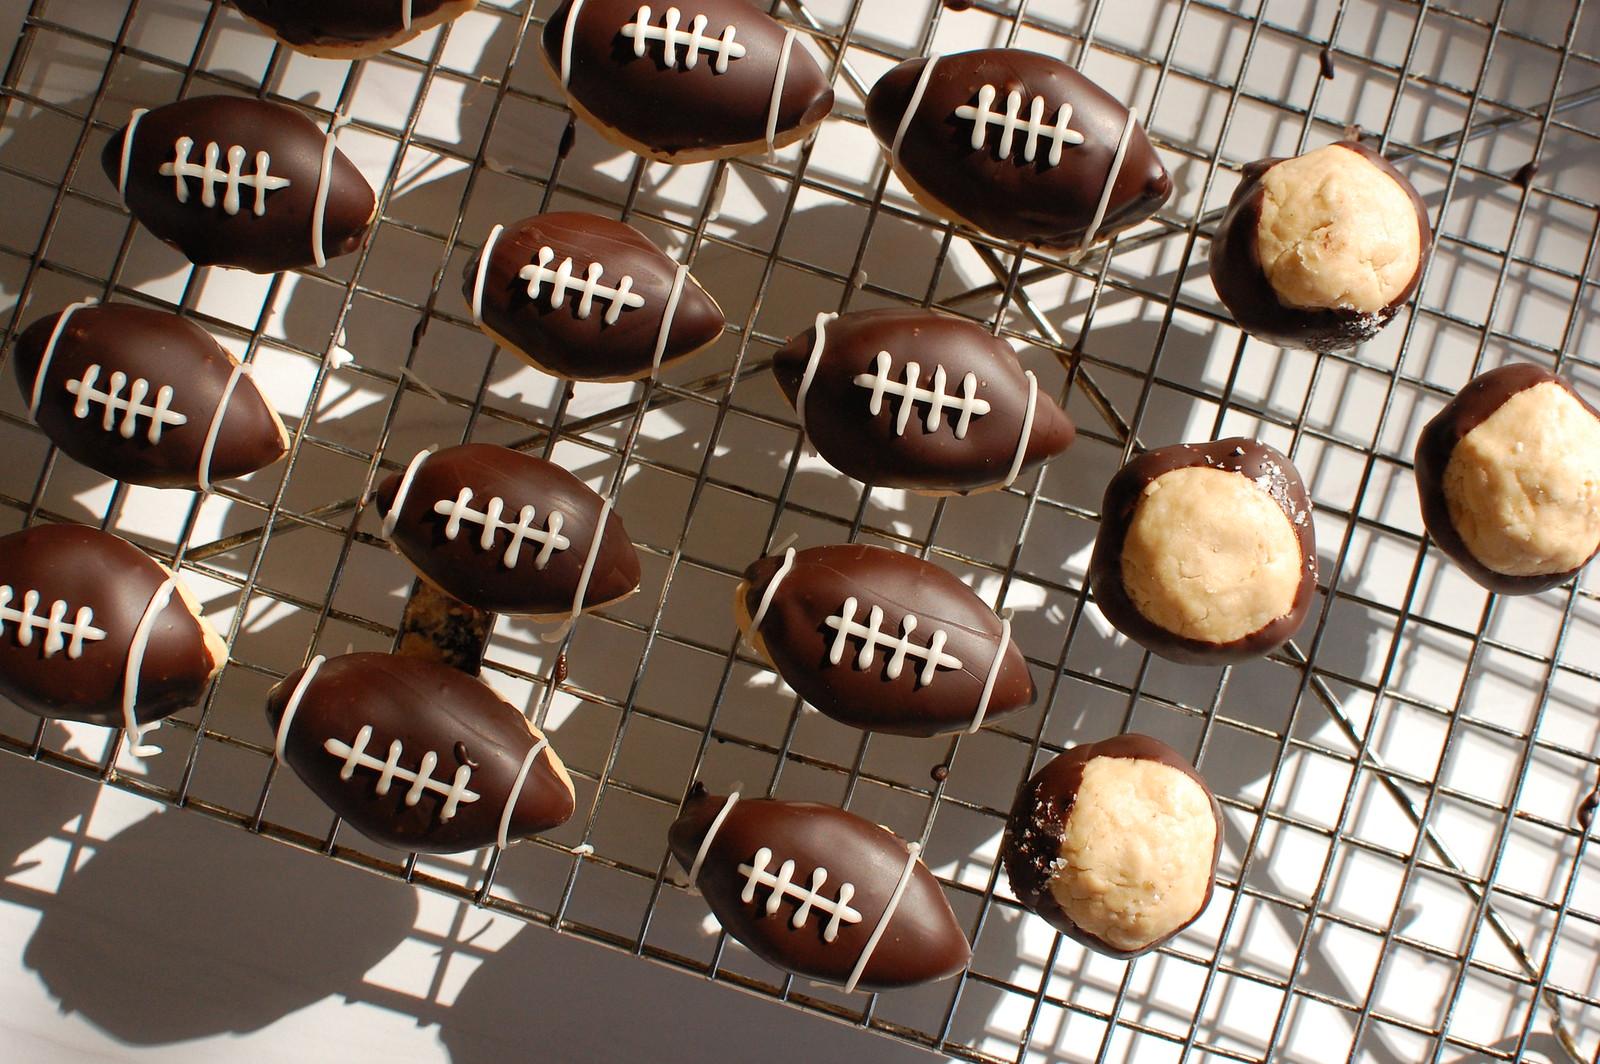 super bowl dessert football buckeyes on cooling rack